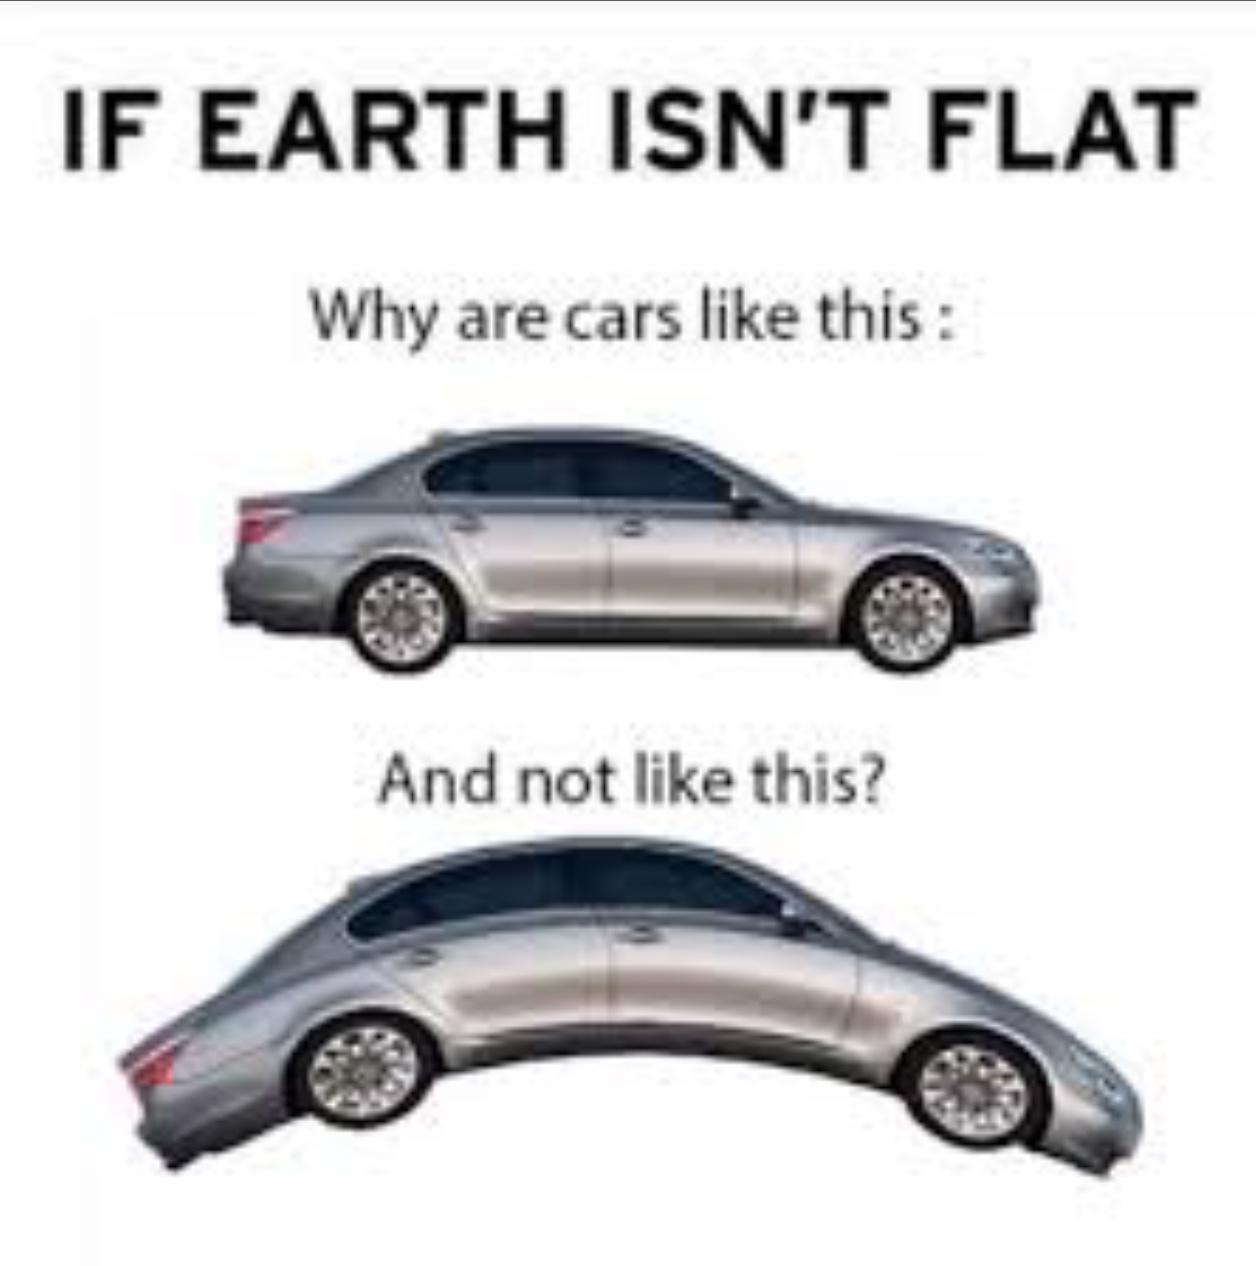 Flat - meme